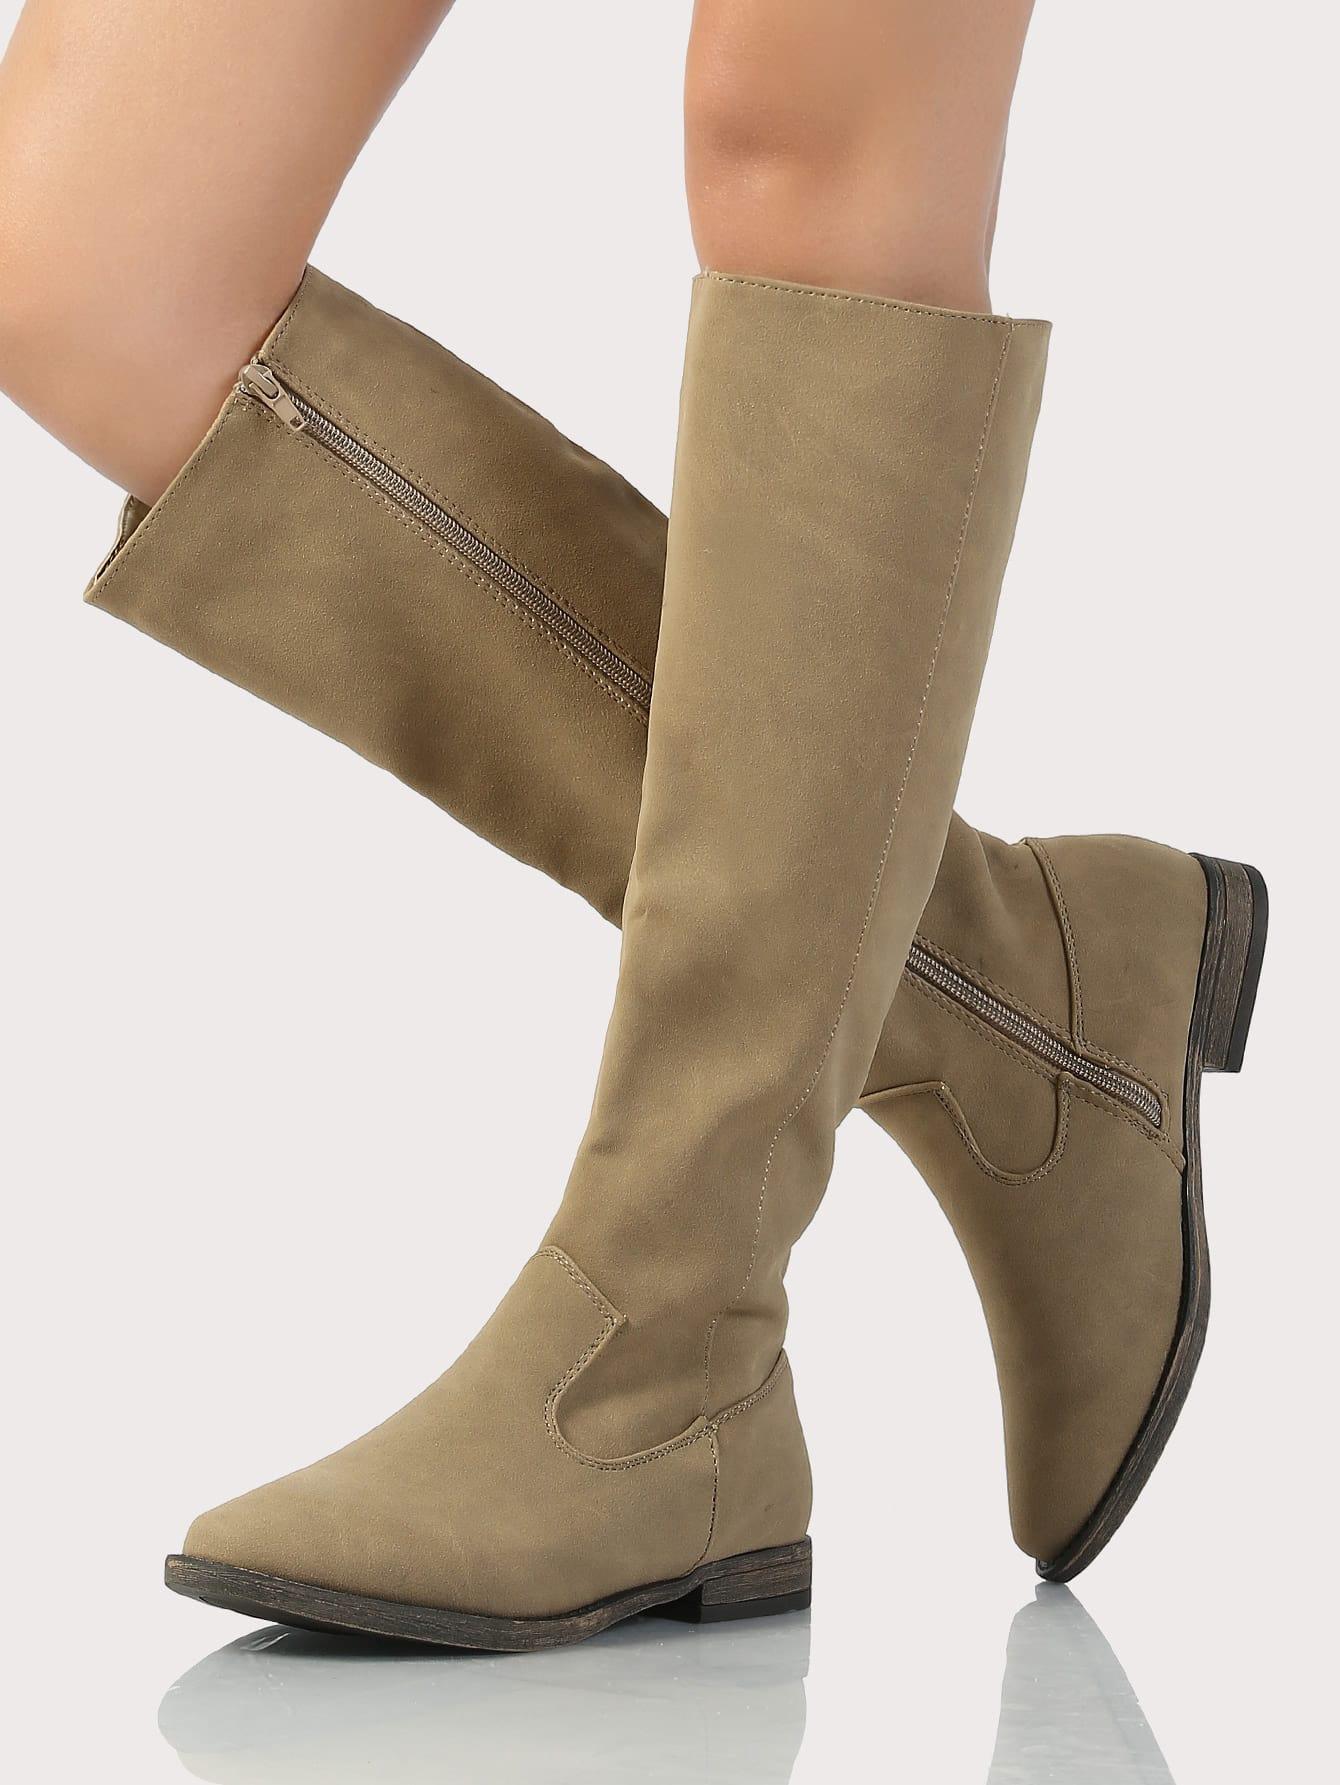 Plain leather boots